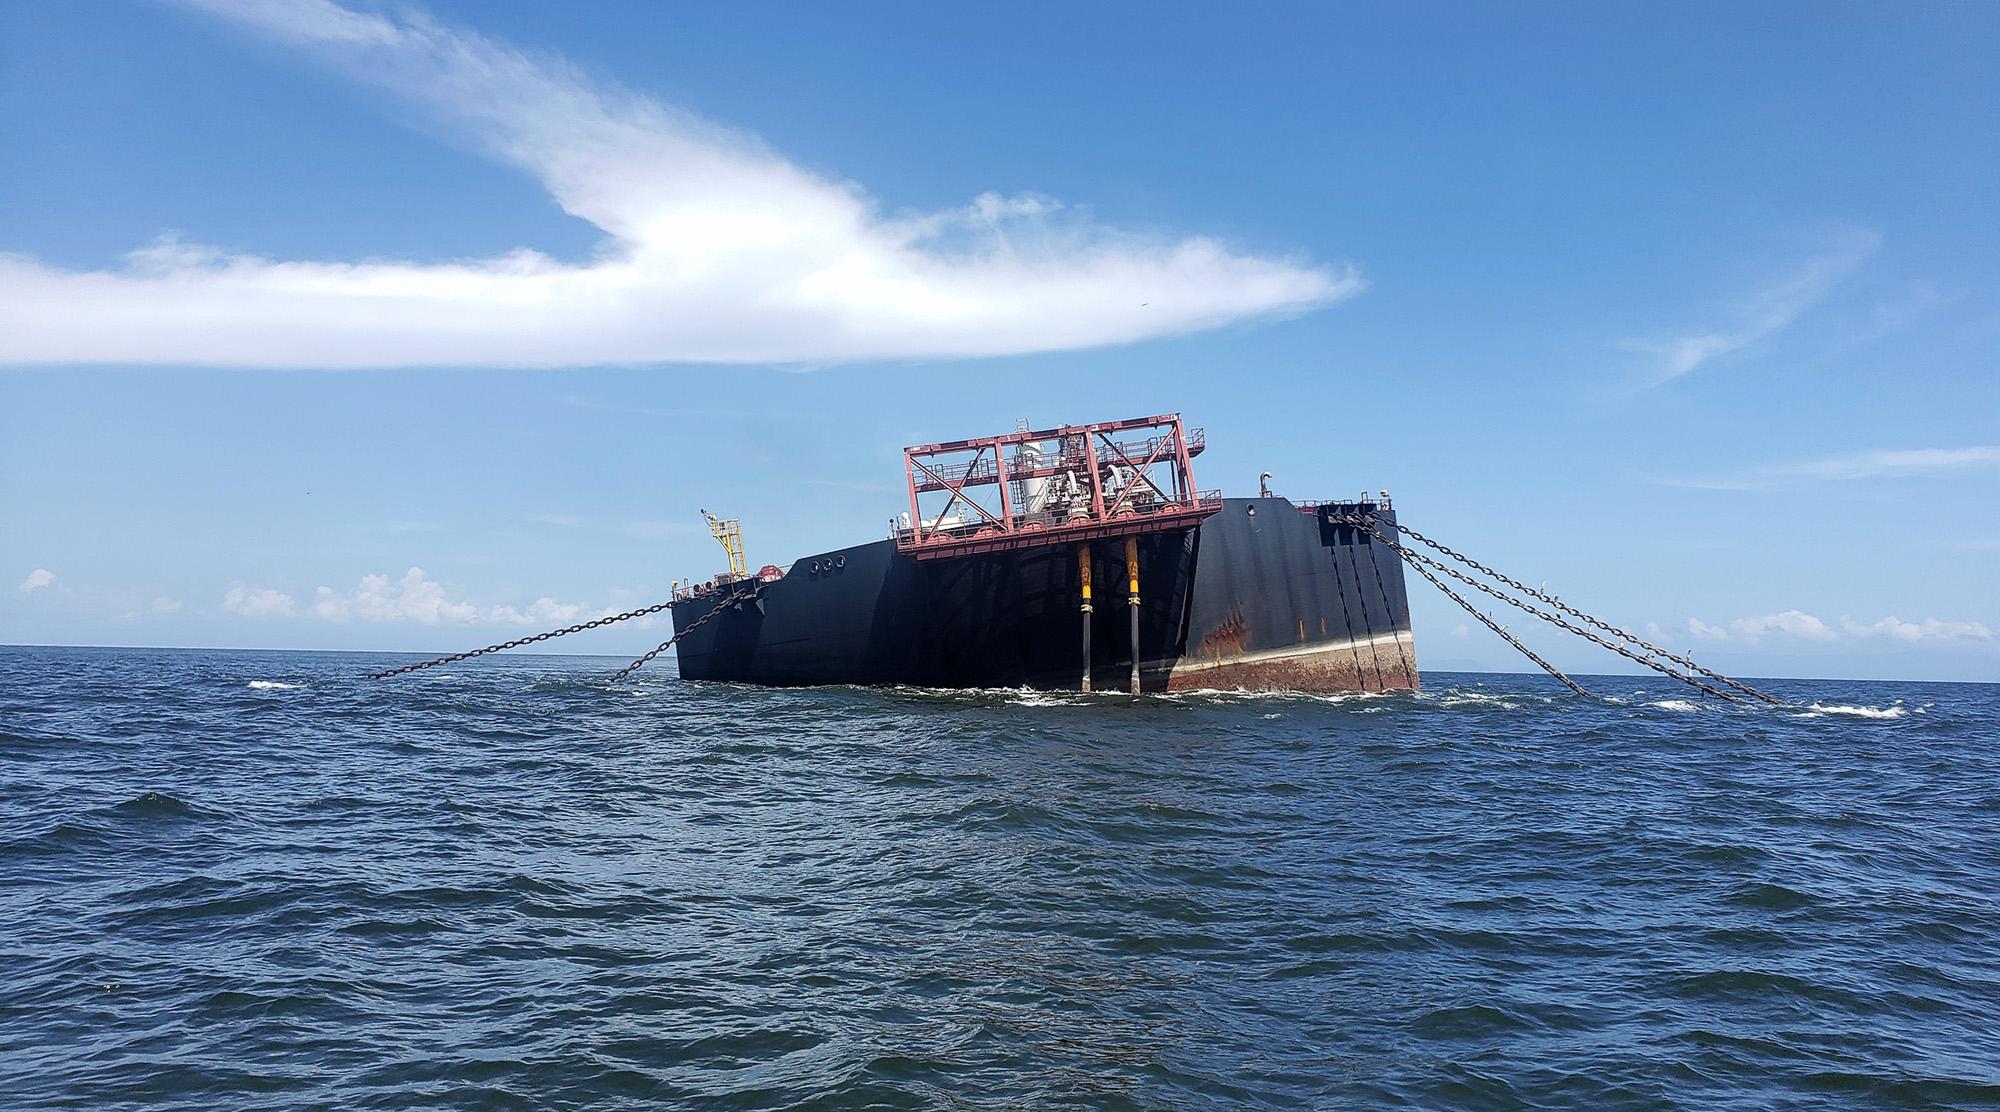 Ship Carrying Million Barrels of Oil is Listing, Gulf of Paria, Venezuela (RealPress)